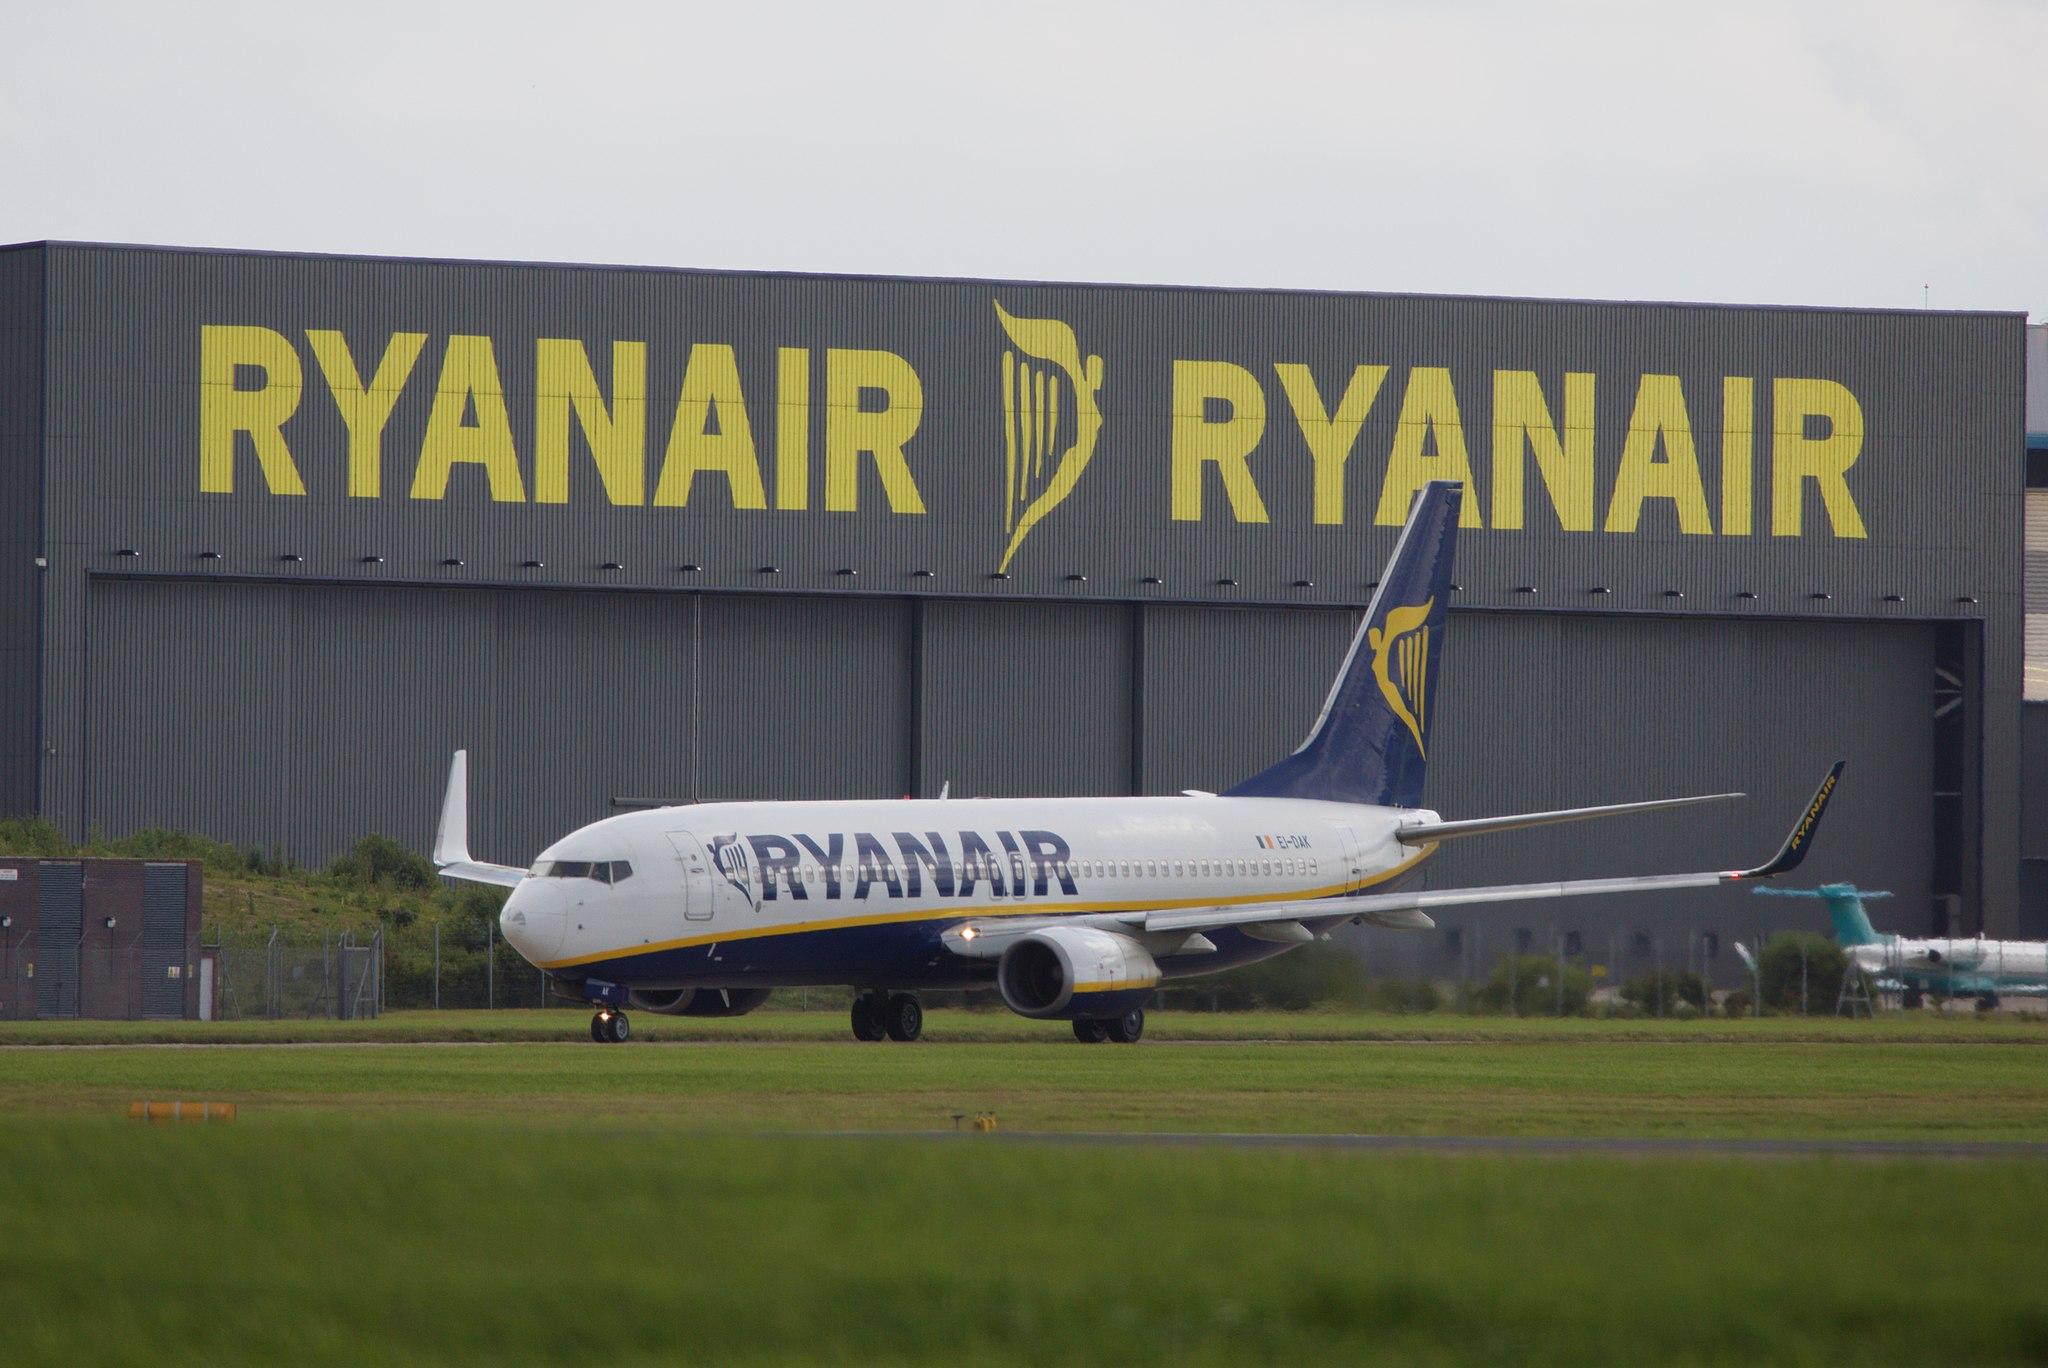 EU bans flights from Belarus airspace